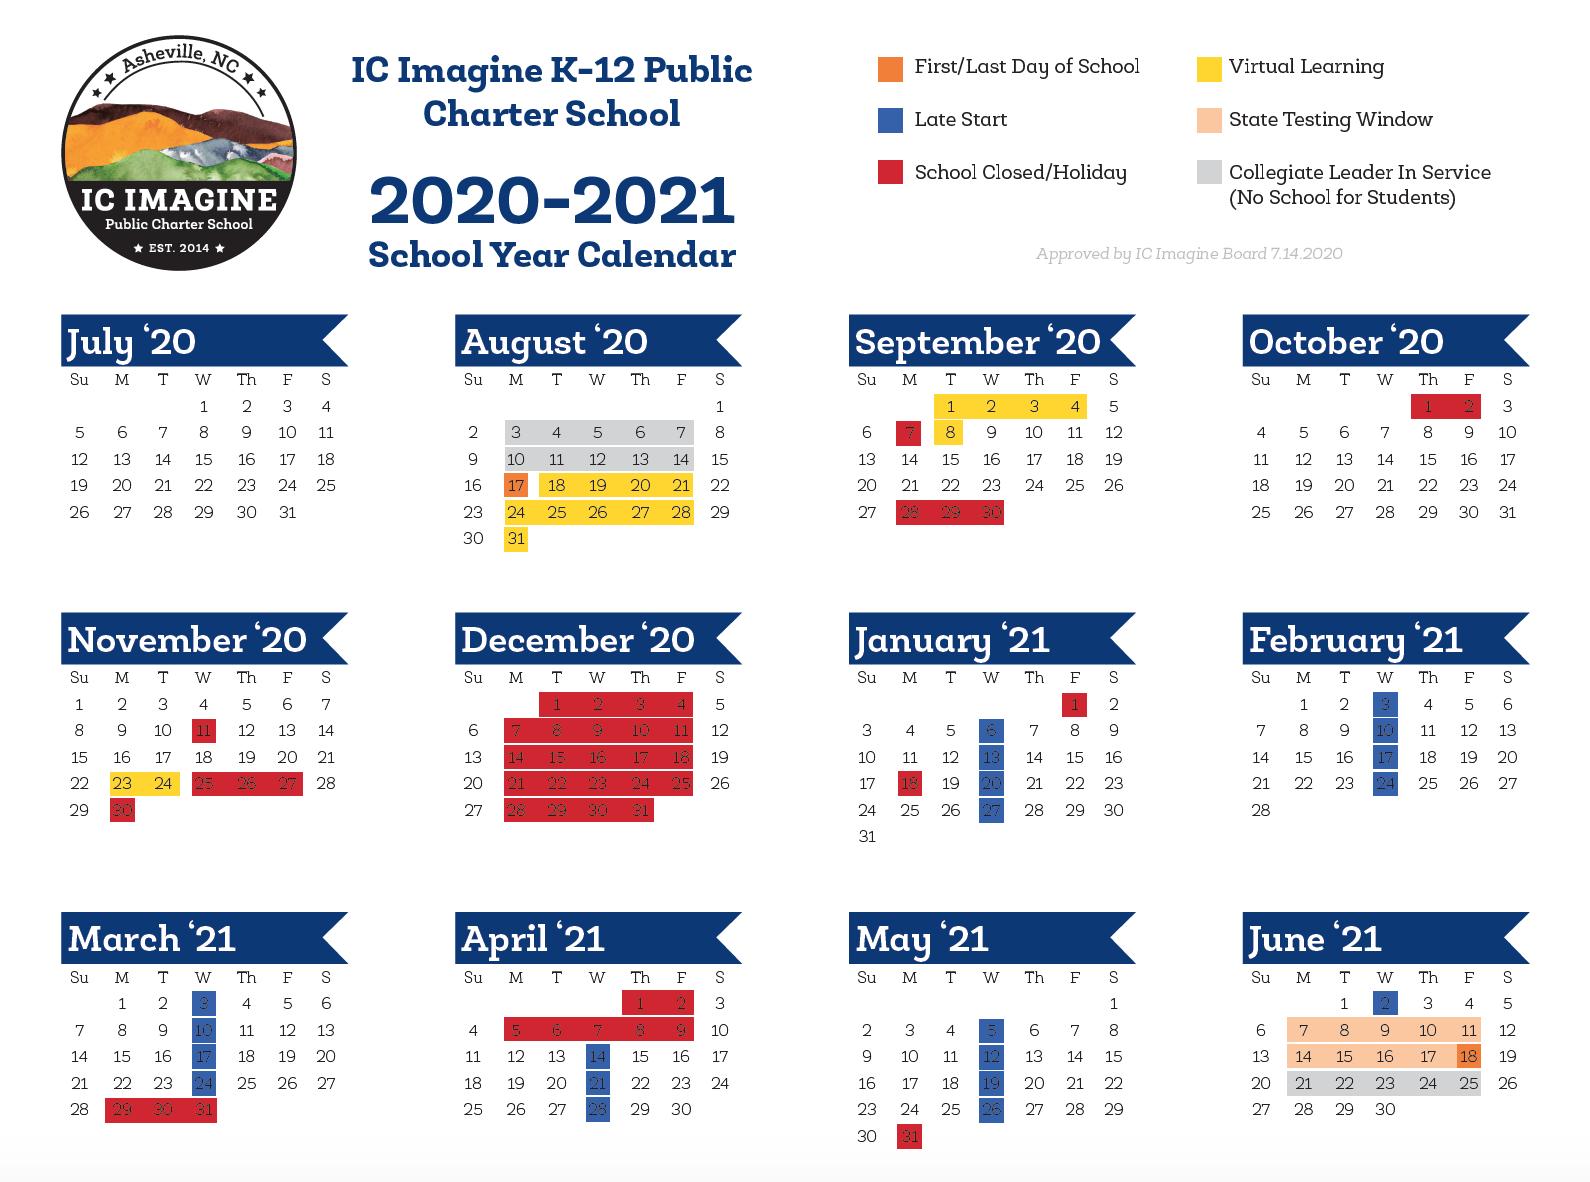 2020 2021 School Calendar – IC Imagine: A Public Charter School